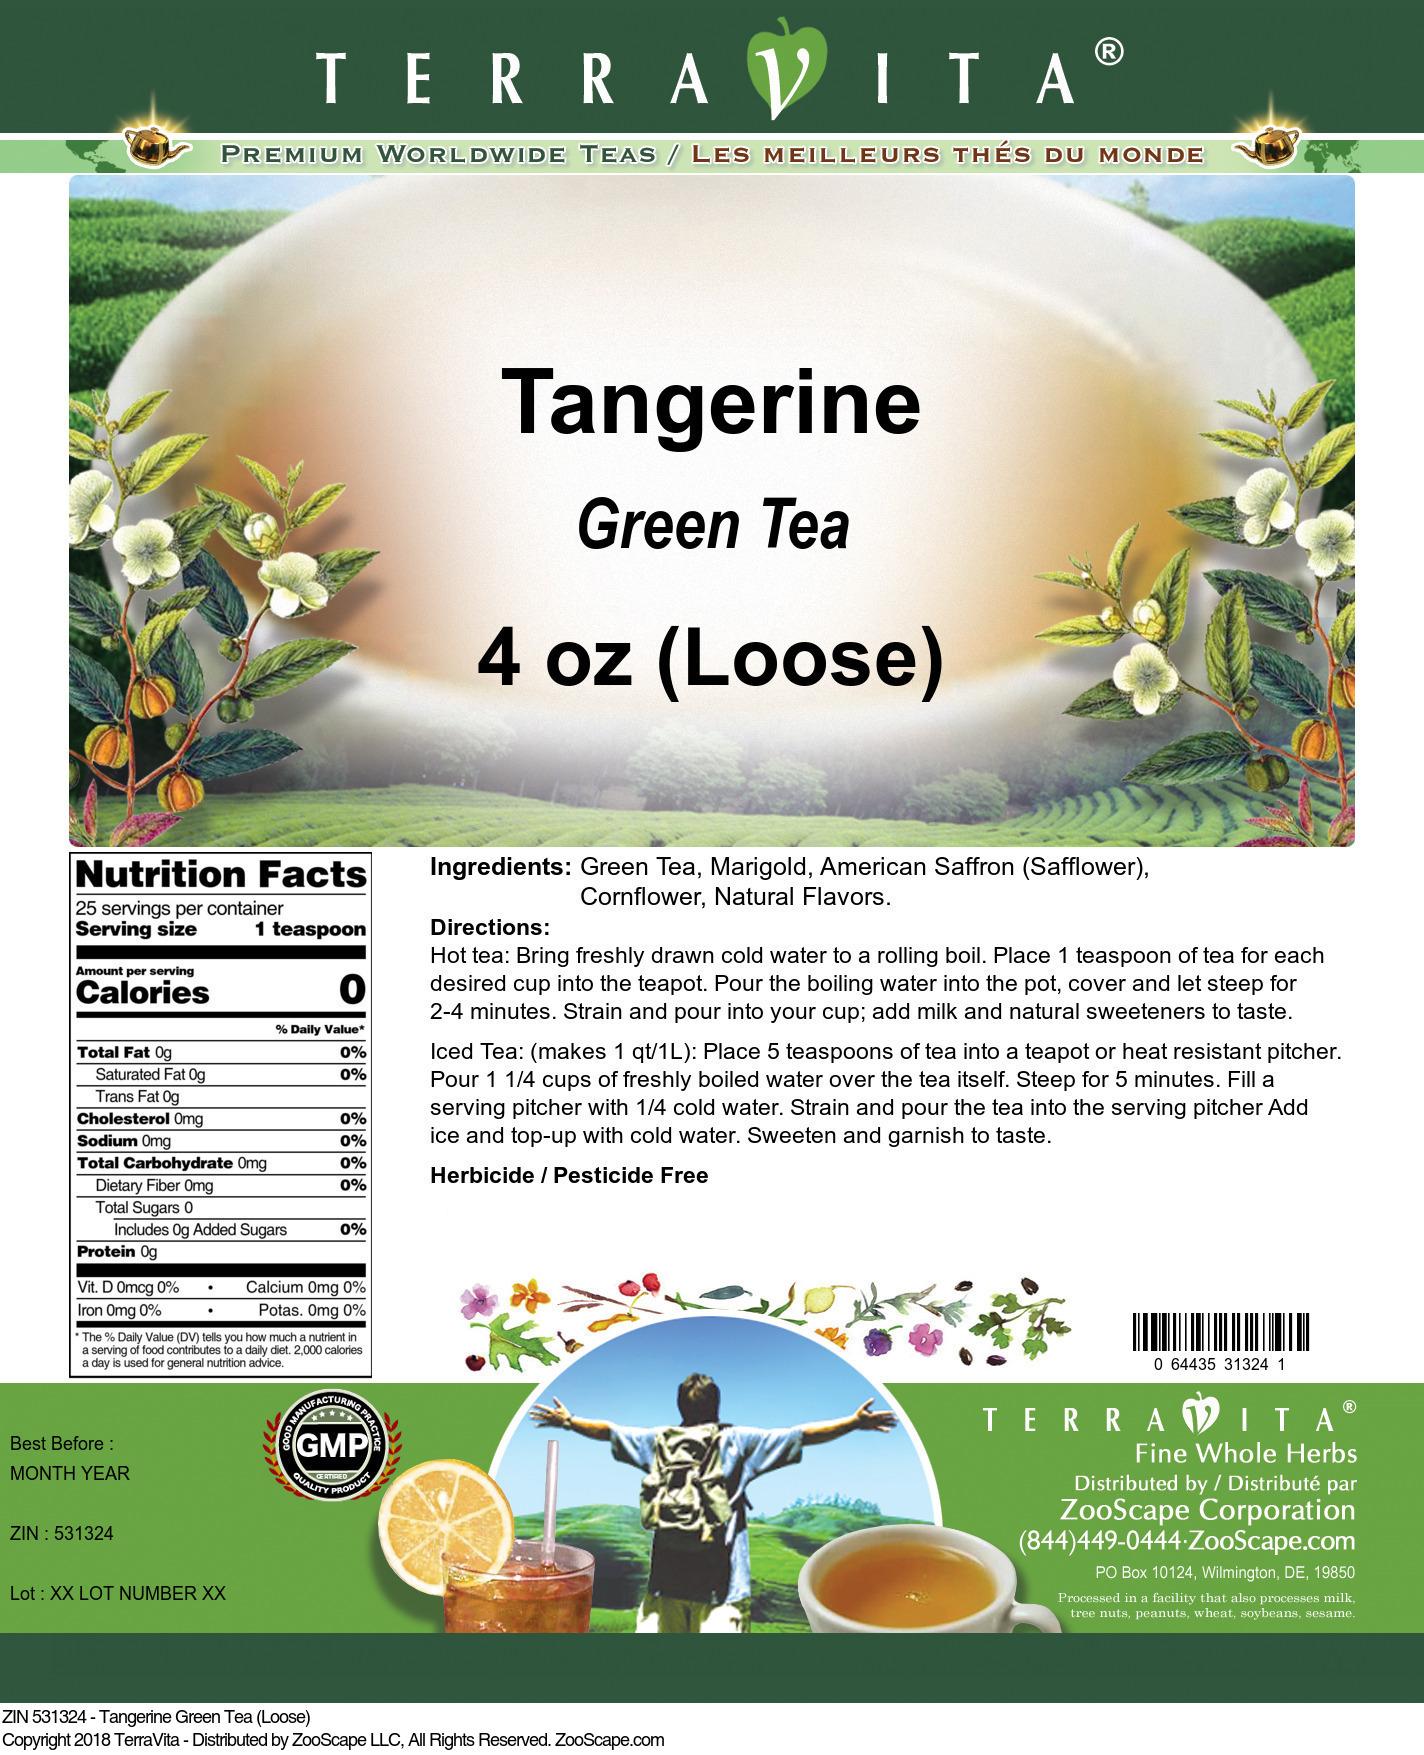 Tangerine Green Tea